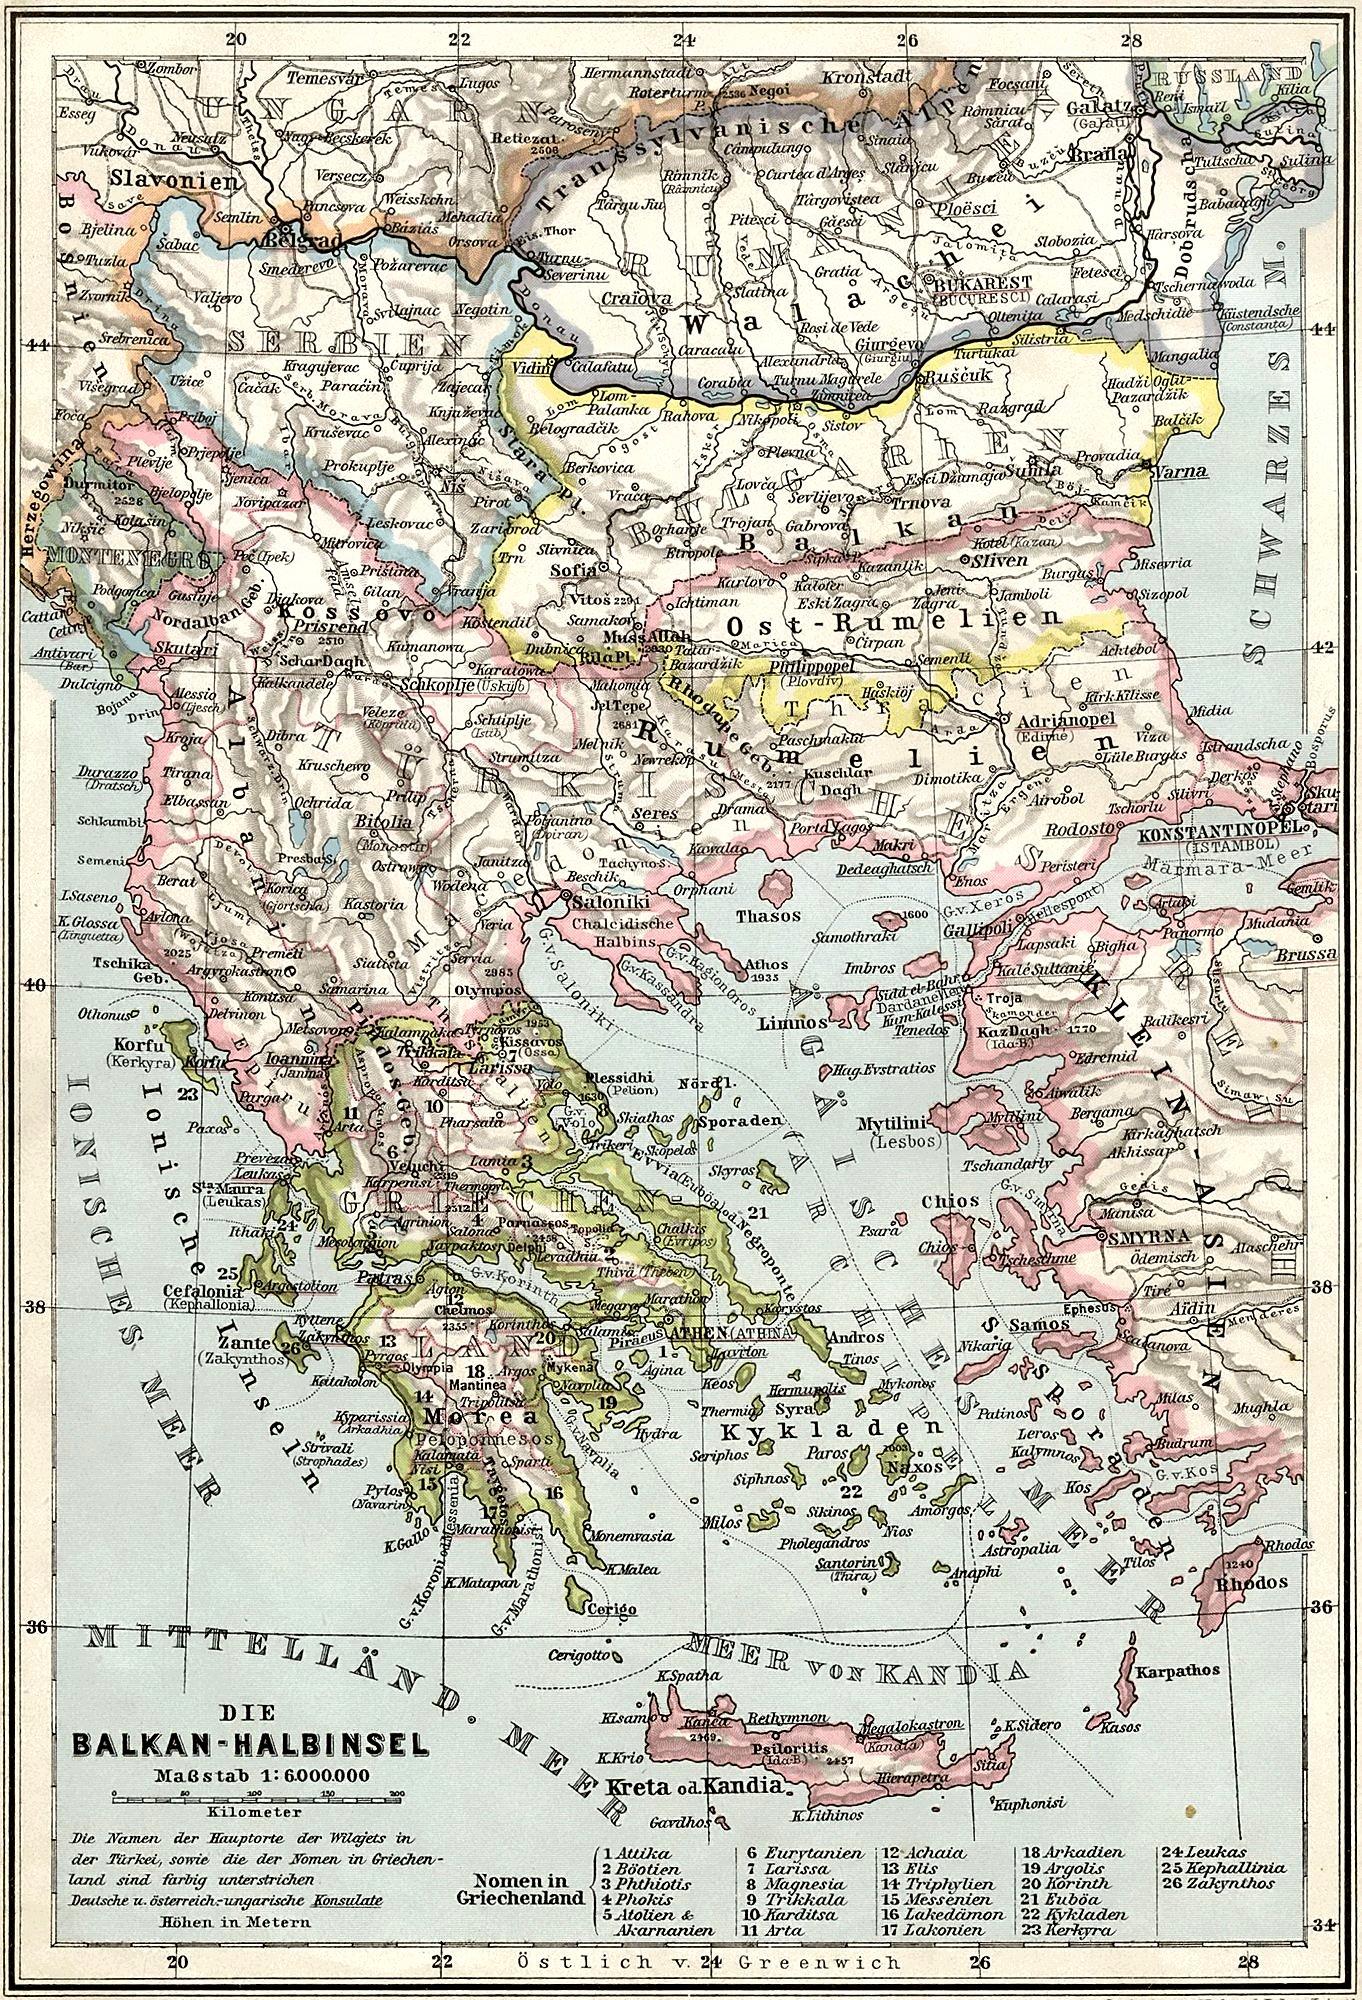 Balkans 1905